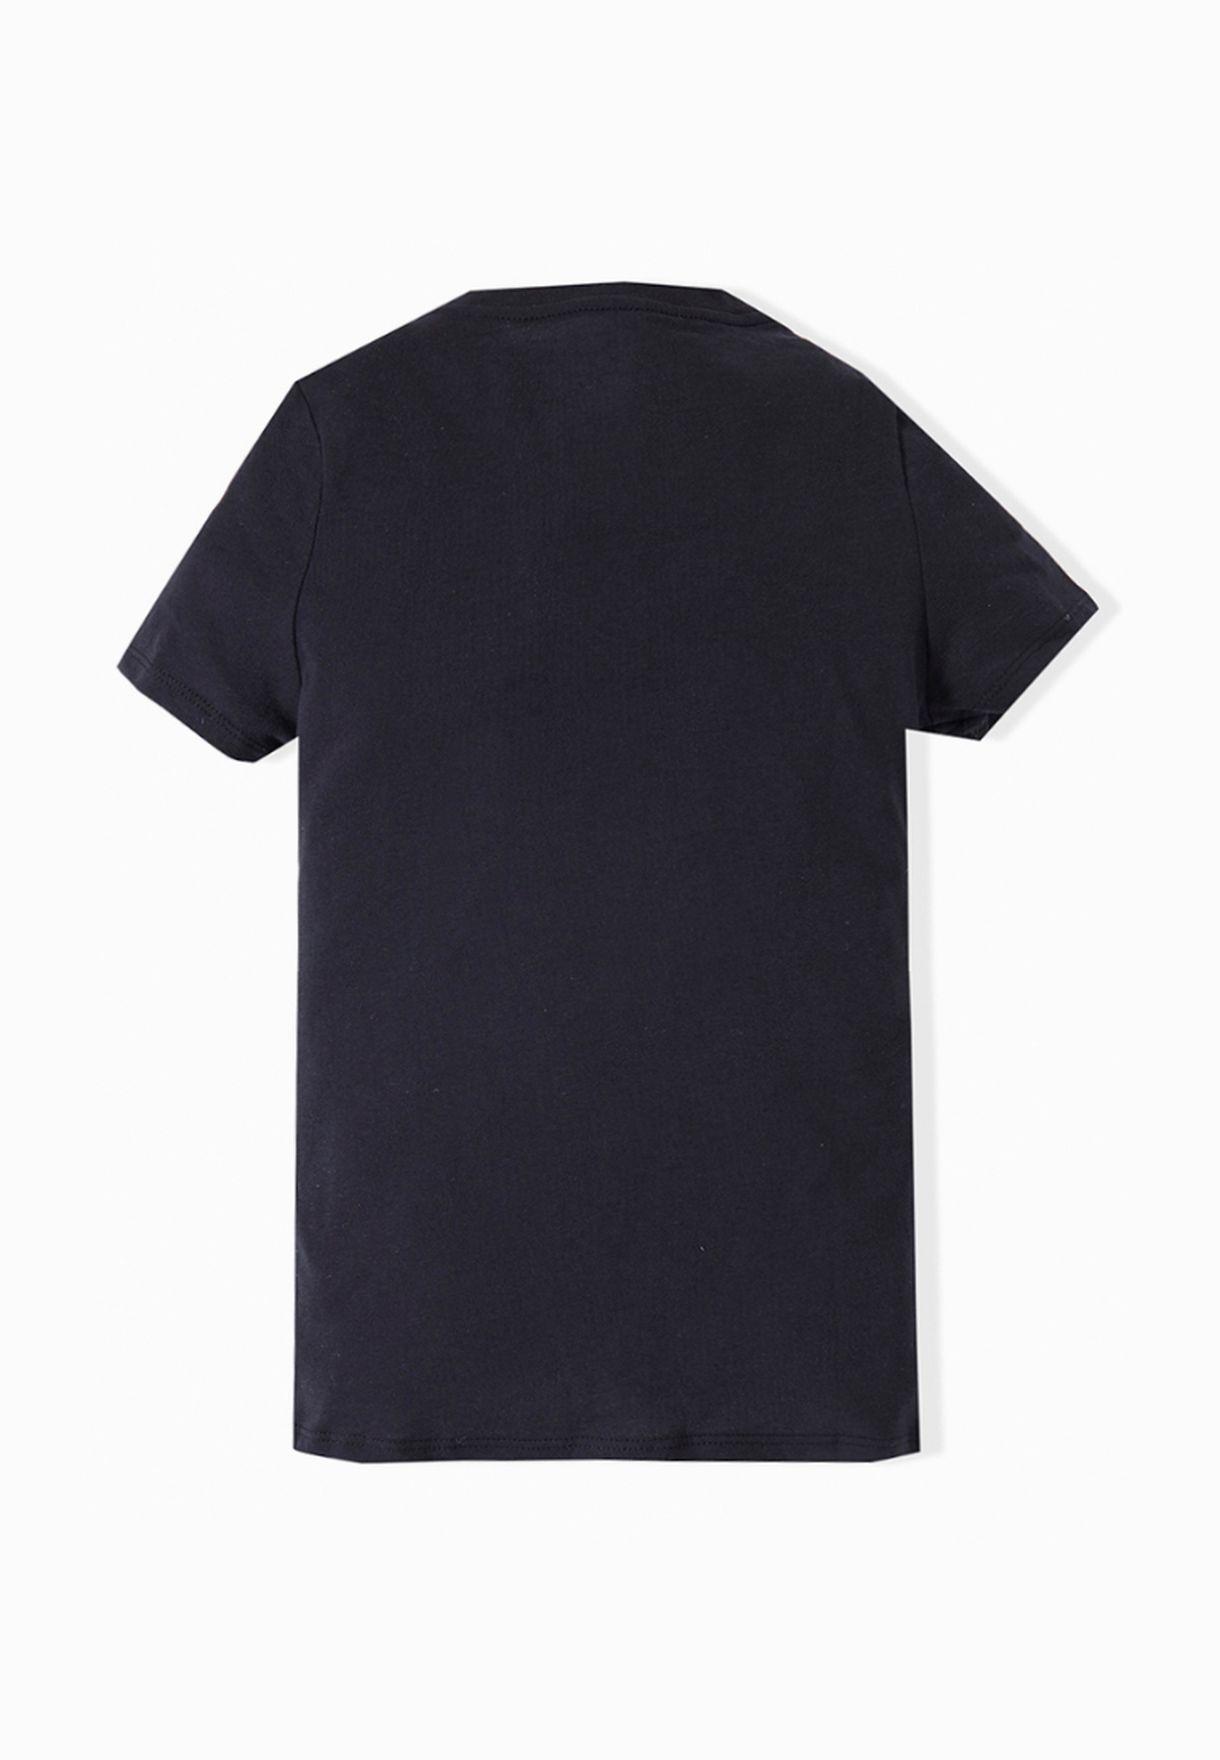 e88d24fe Shop Nike black Youth Free T-Shirt 709133-010 for Kids in Kuwait ...